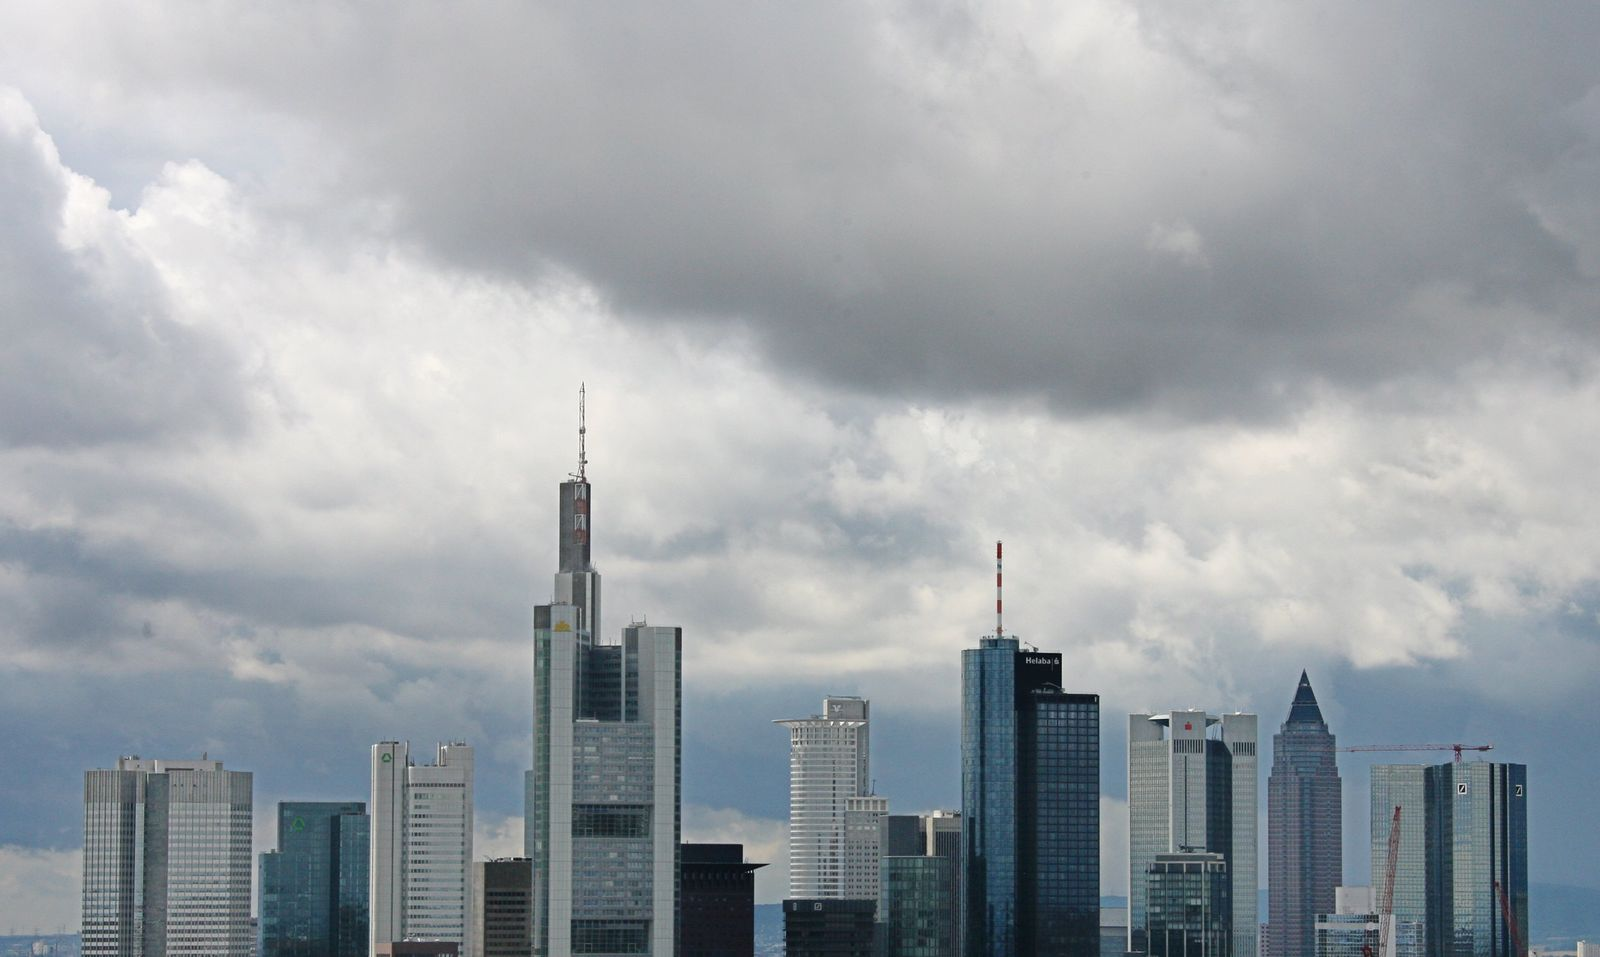 THEMEN Banken / Frankfurt / Skyline